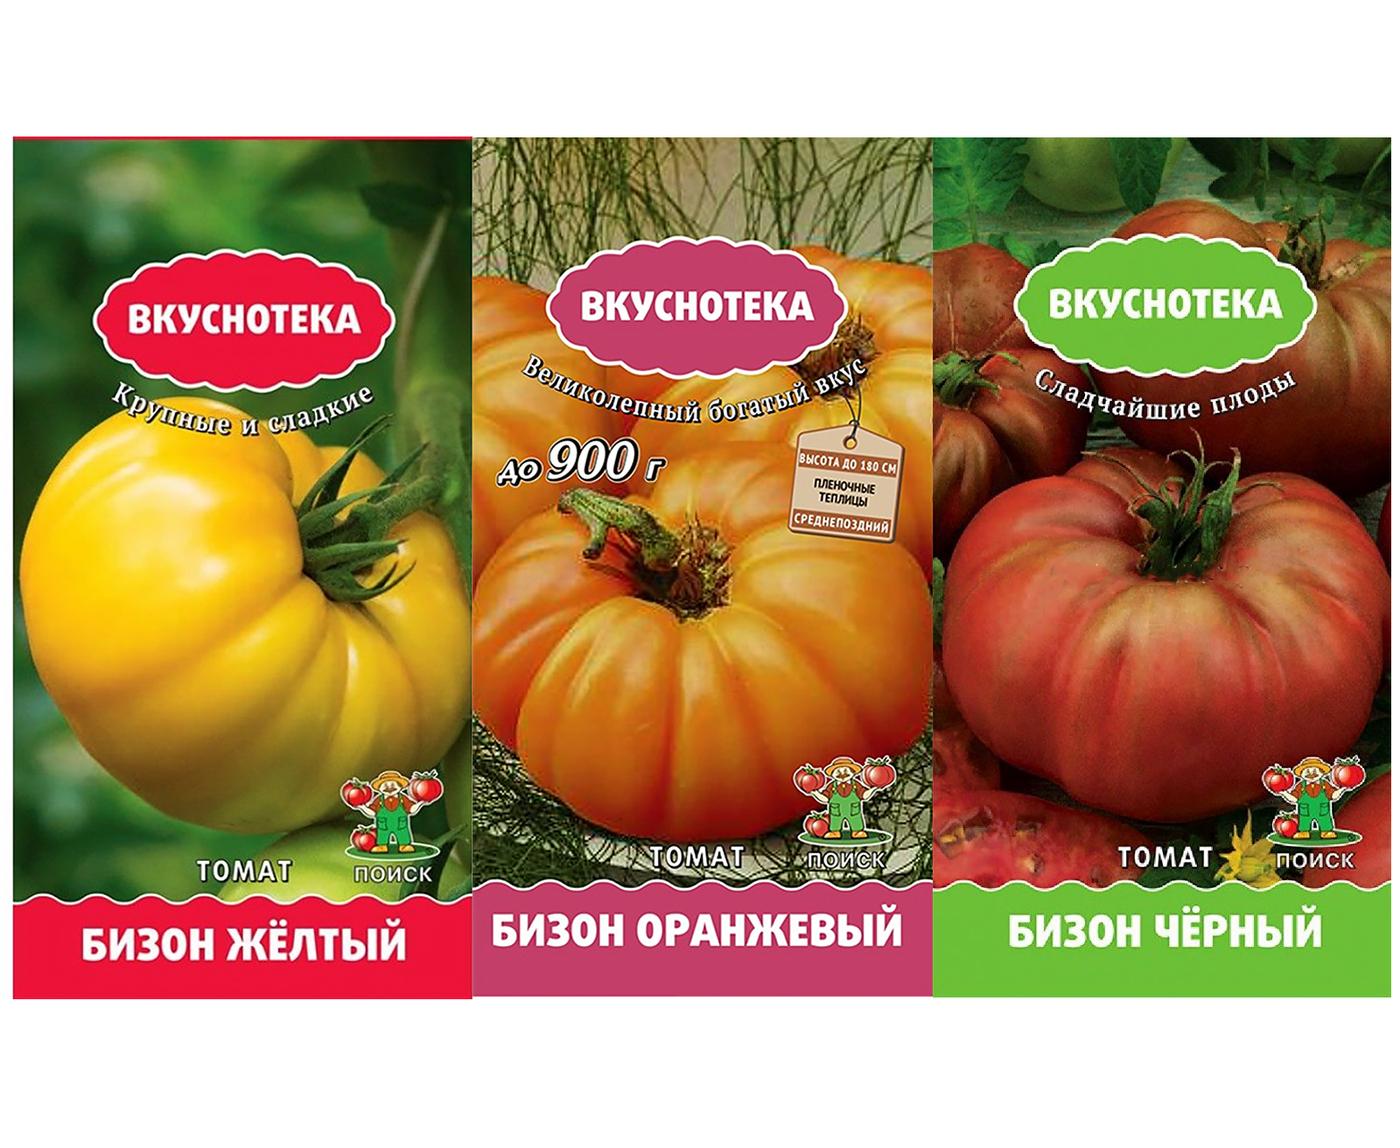 Характеристика томата сахарный бизон и особенности выращивания